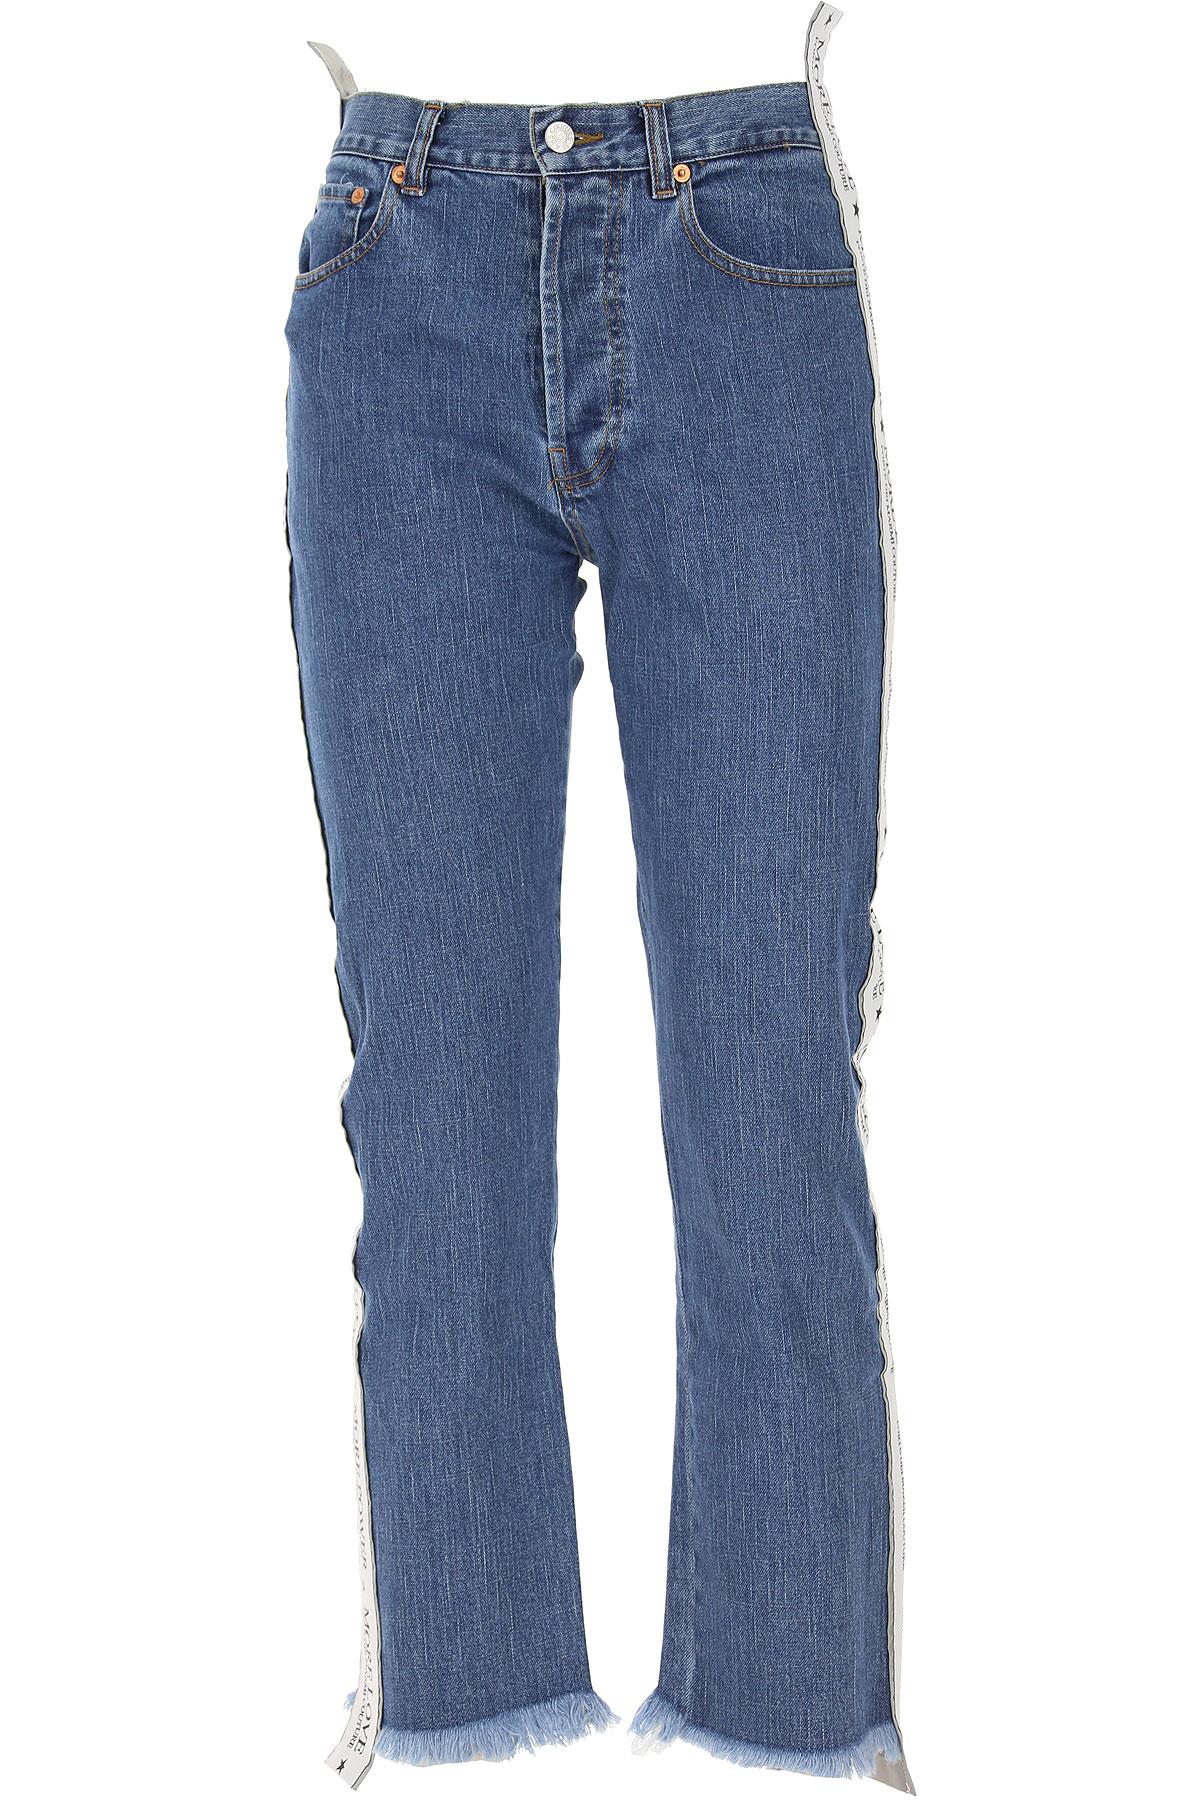 Forte Dei Marmi Couture Denim Jeans In Saldo, Denim Blu, Cotone, 2019, 39 40 41 42 42